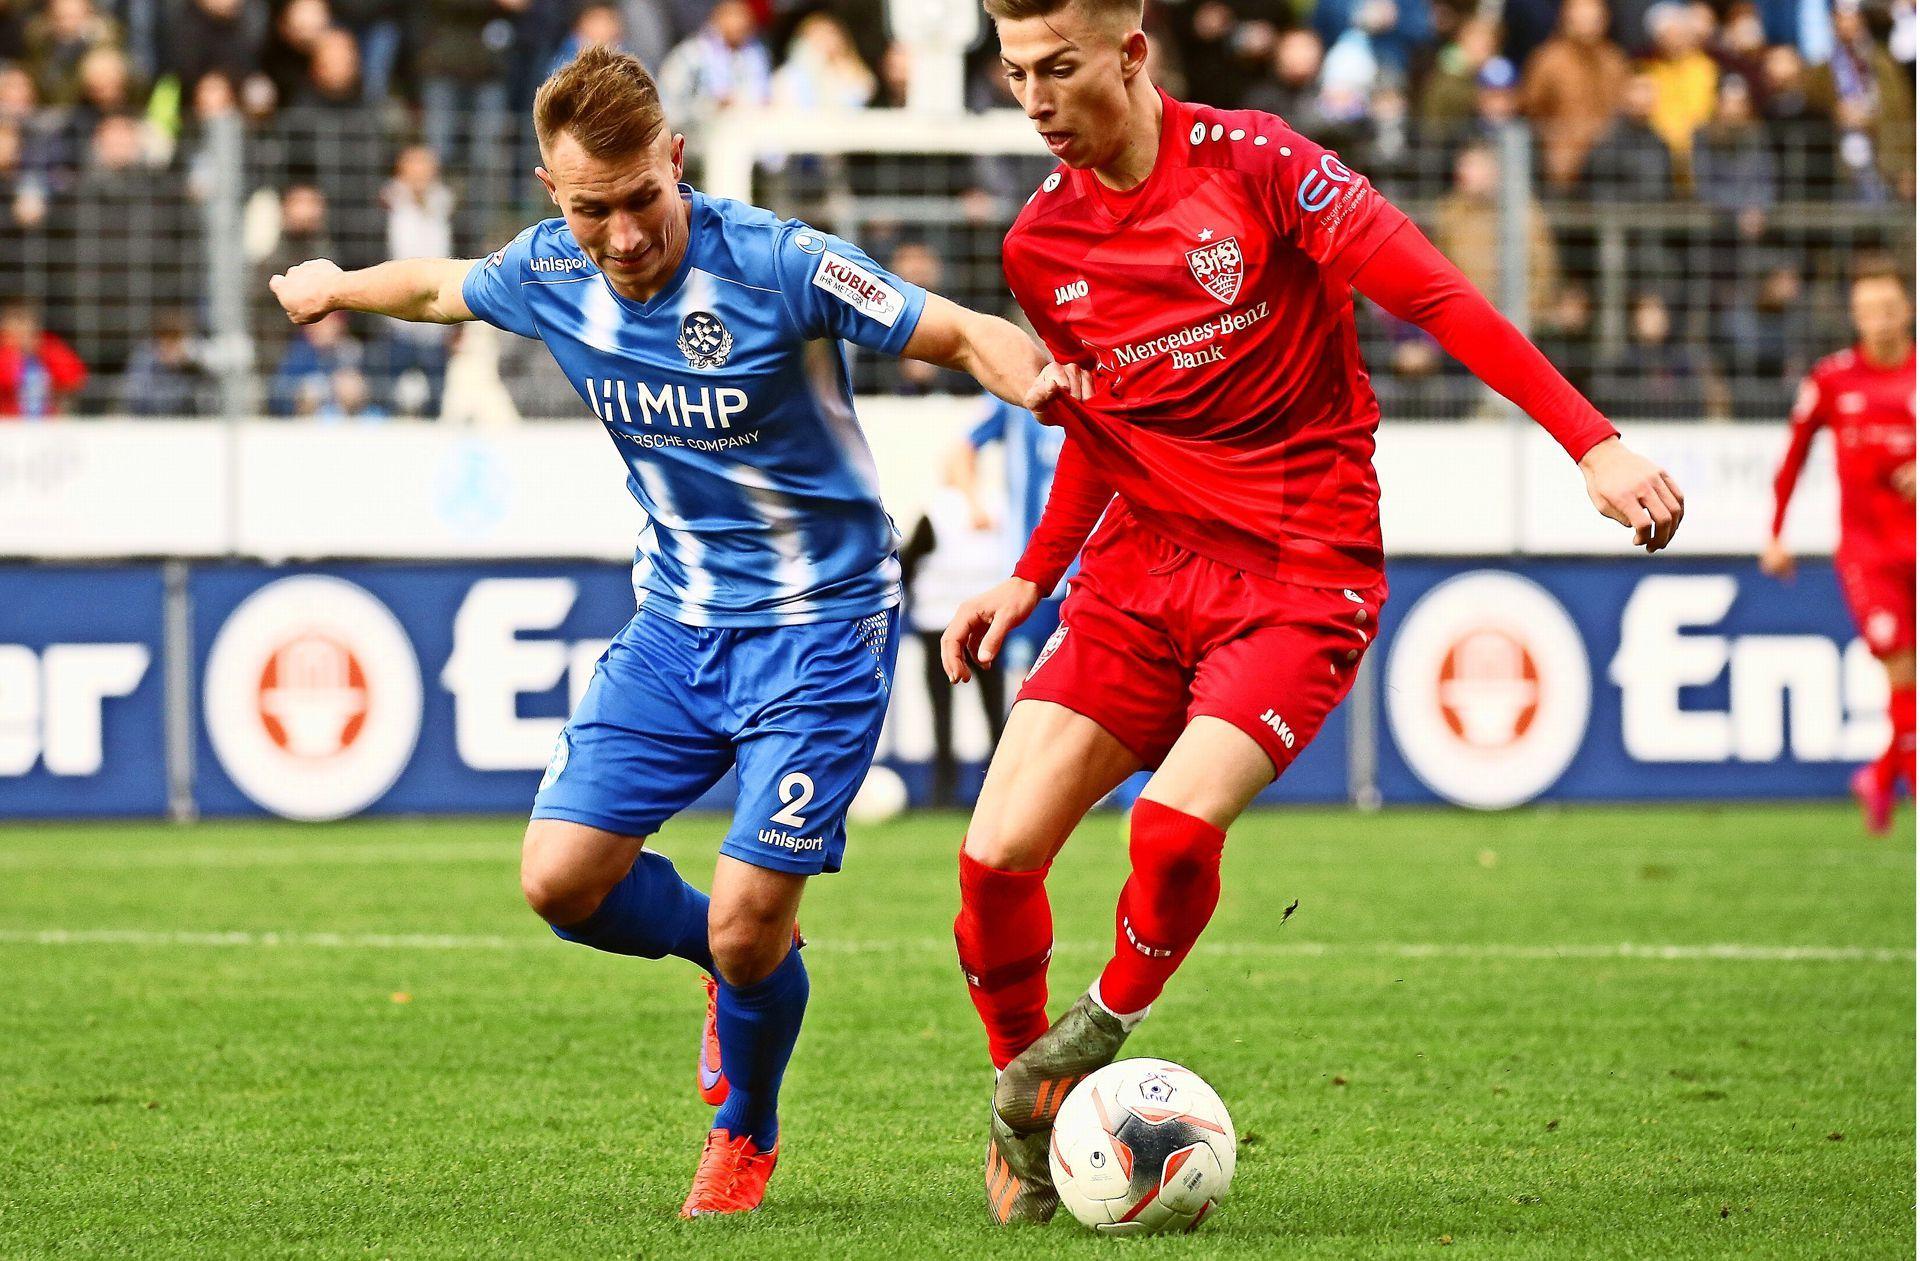 Letzter Oberliga Spieltag 2019 Stuttgarter Kickers Gegen